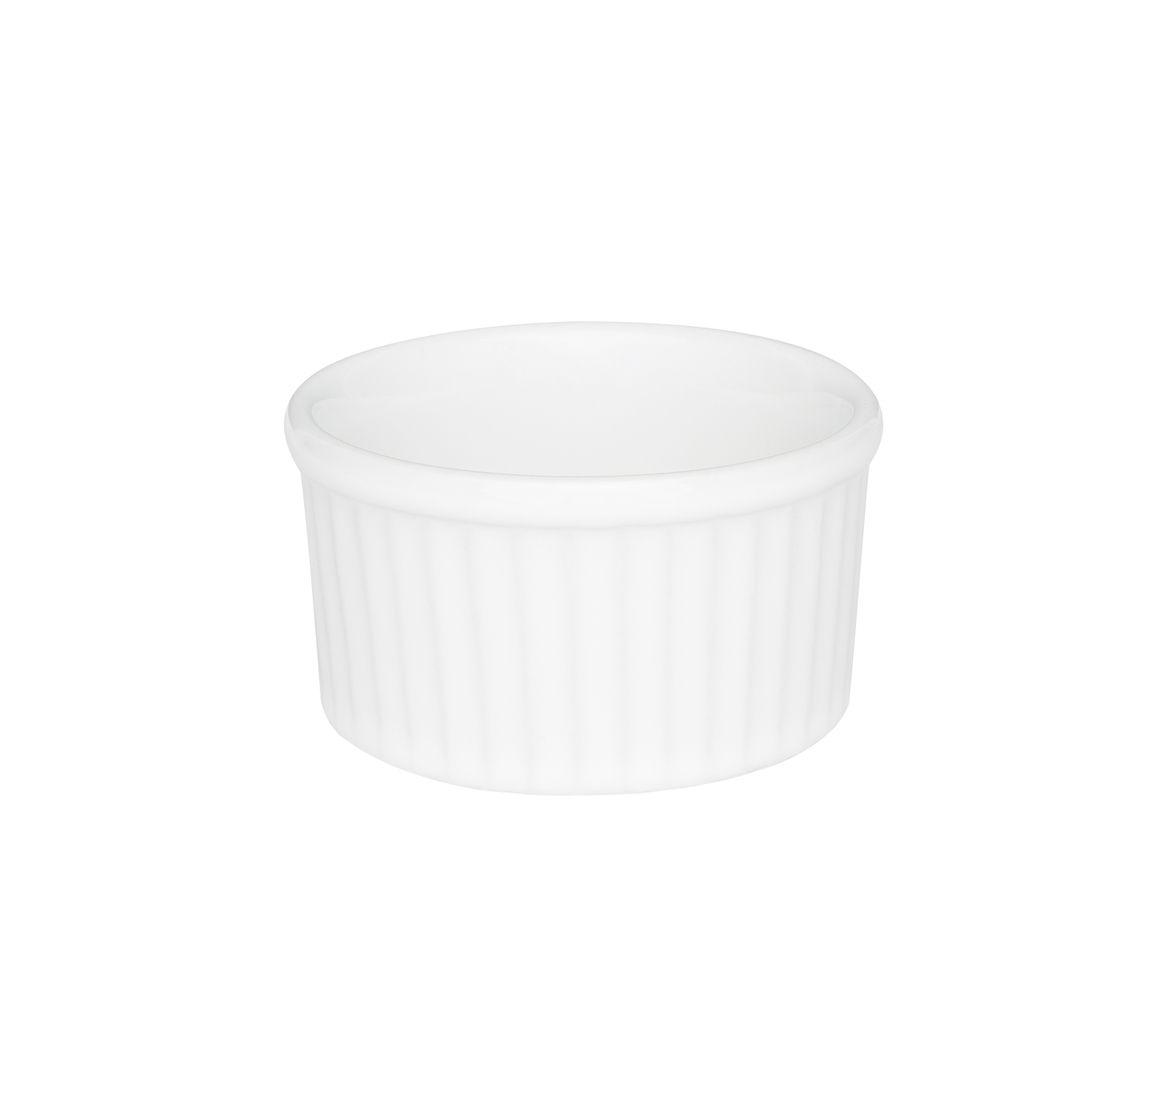 Tigela Ramequin 8X4Cm 100Ml - Branco - Oxford Porcelanas